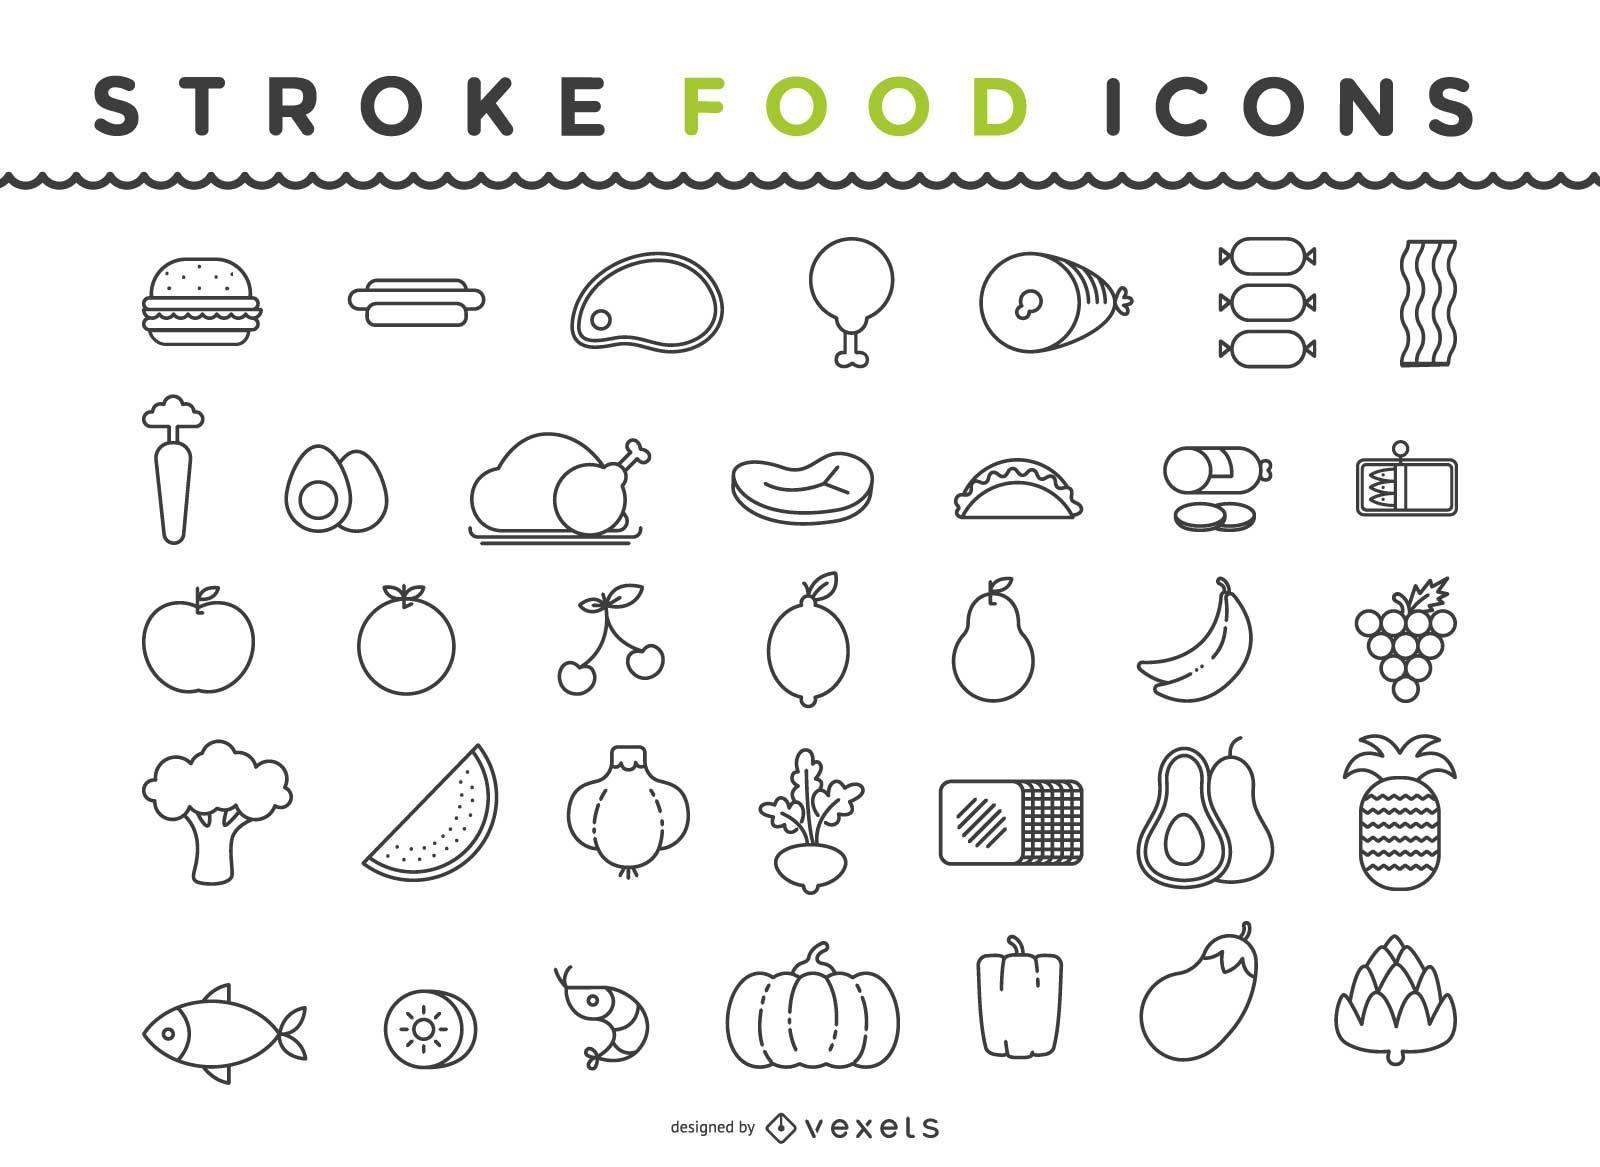 Food Icon Pack Gliederung